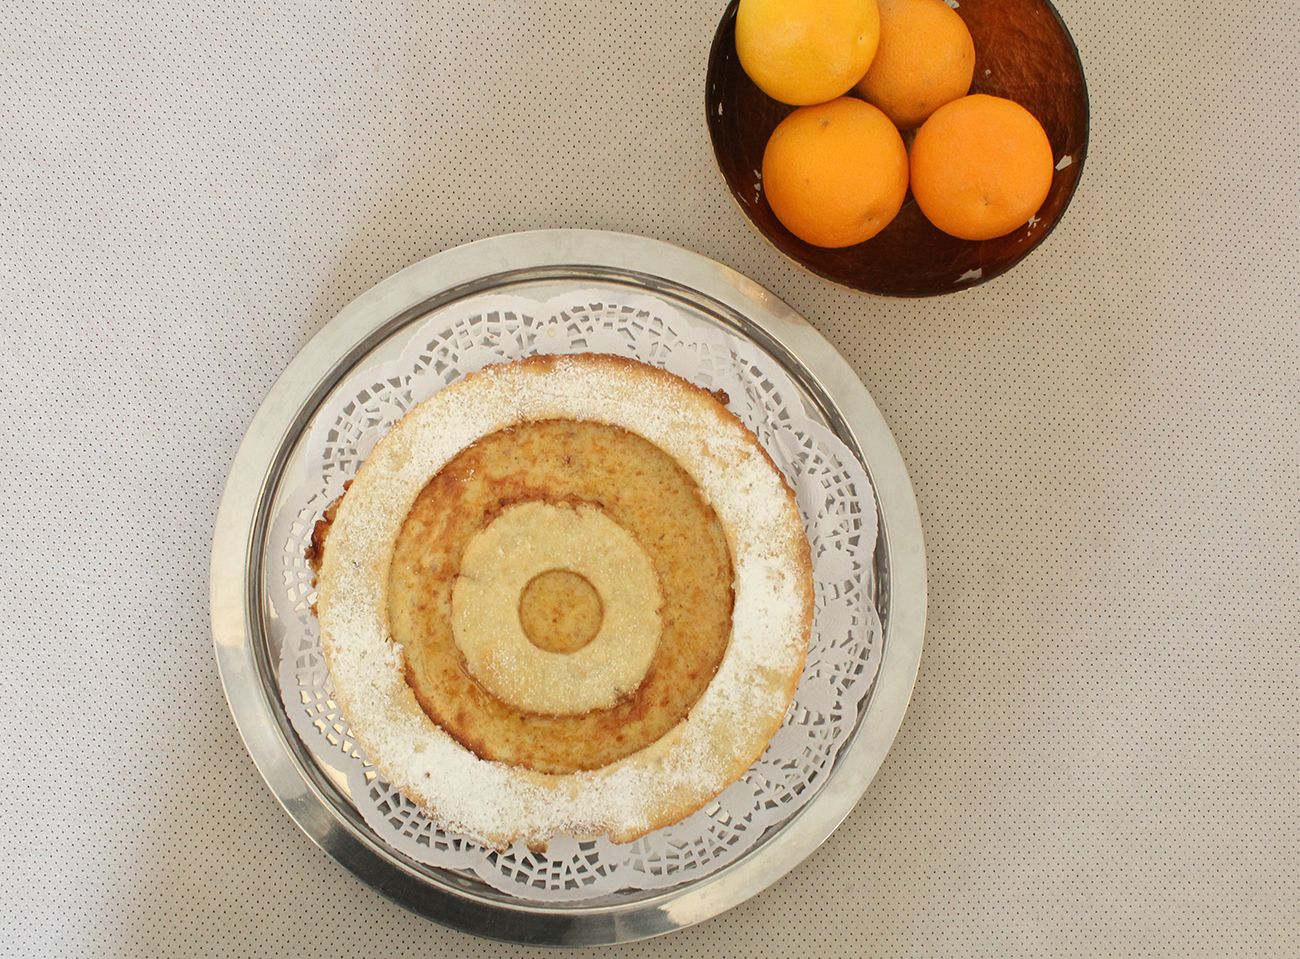 IMG 3522 - טארט תפוזים ושקדים